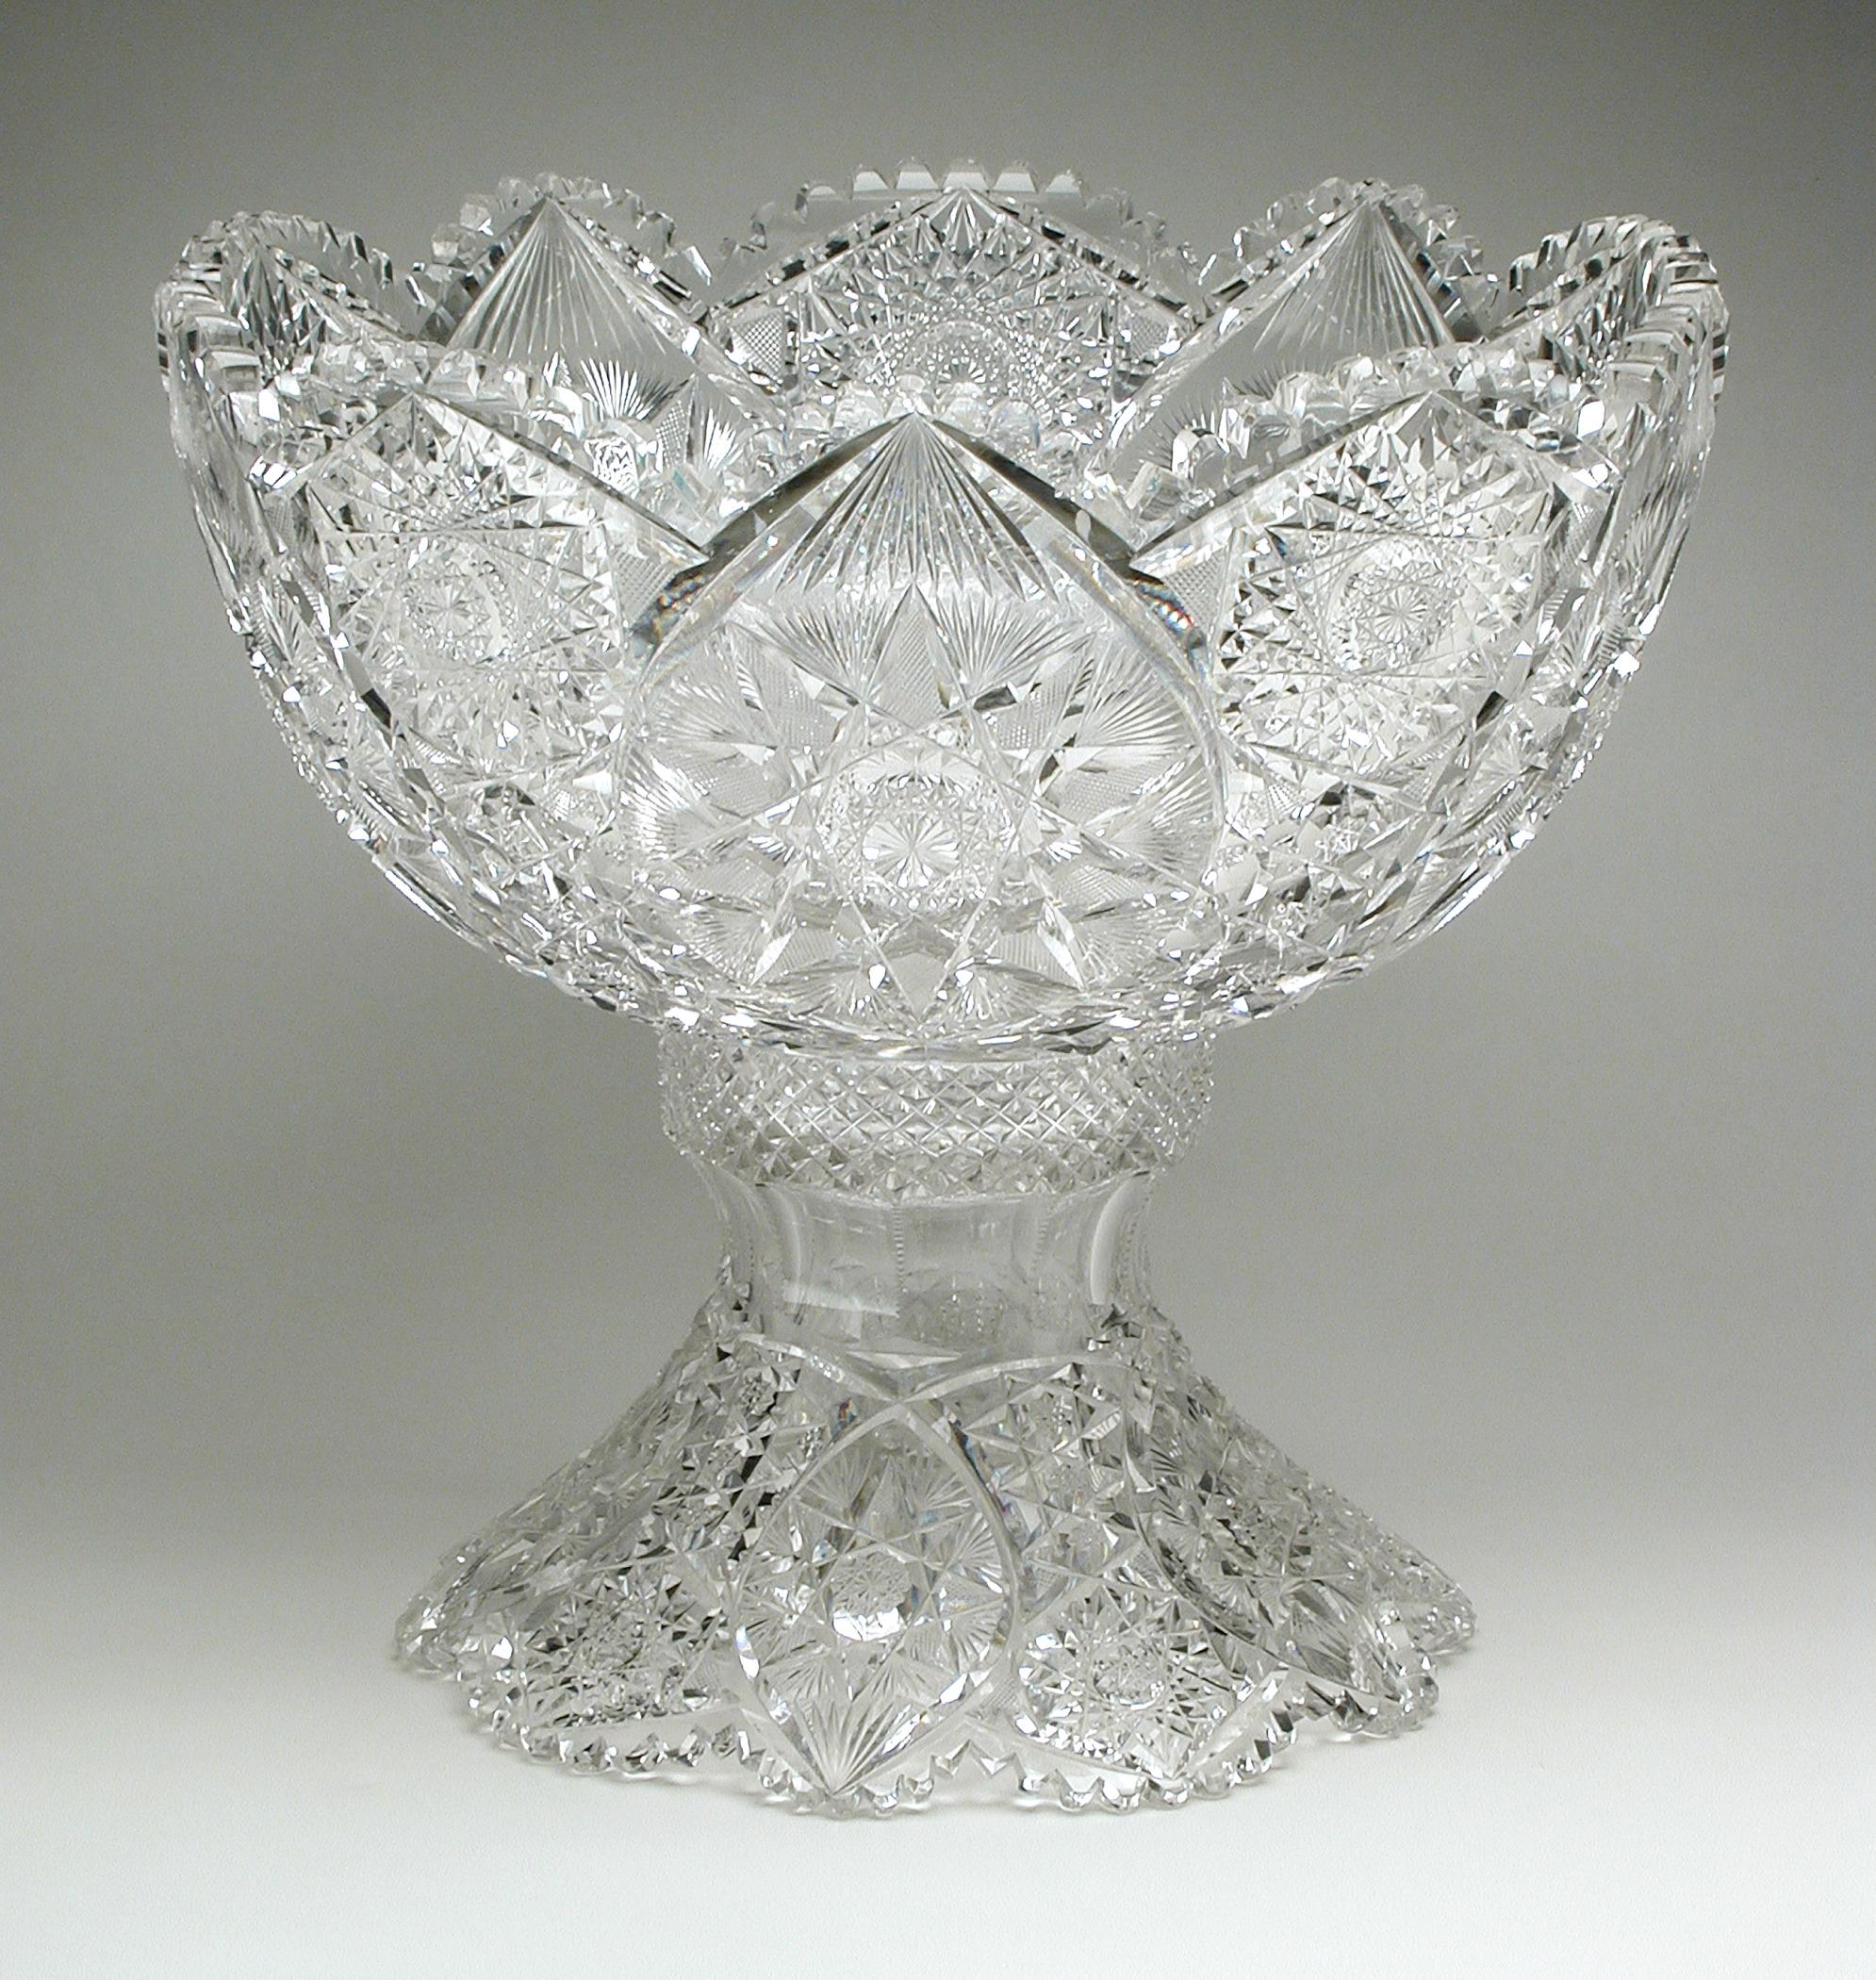 File:Punch Bowl on Stand LACMA M.91.320.6.jpg - Wikimedia ...